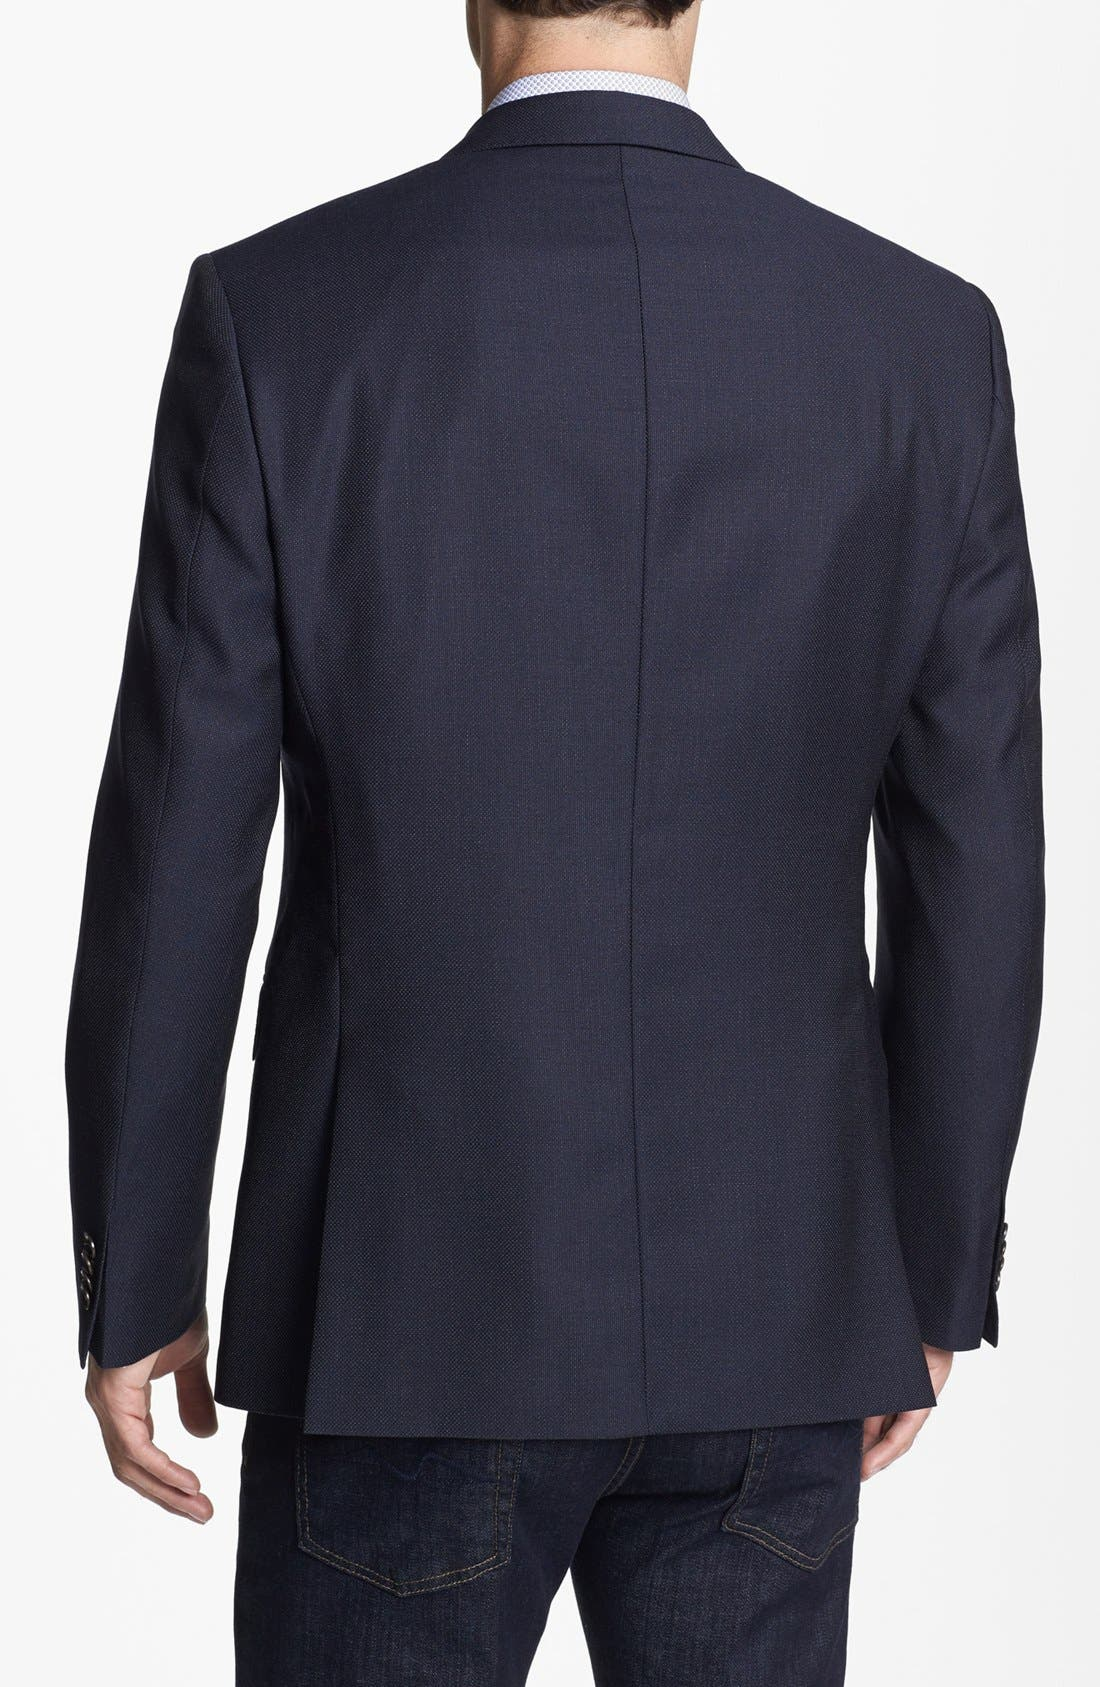 Alternate Image 3  - BOSS Black 'The Keys' Trim Fit Wool Blazer